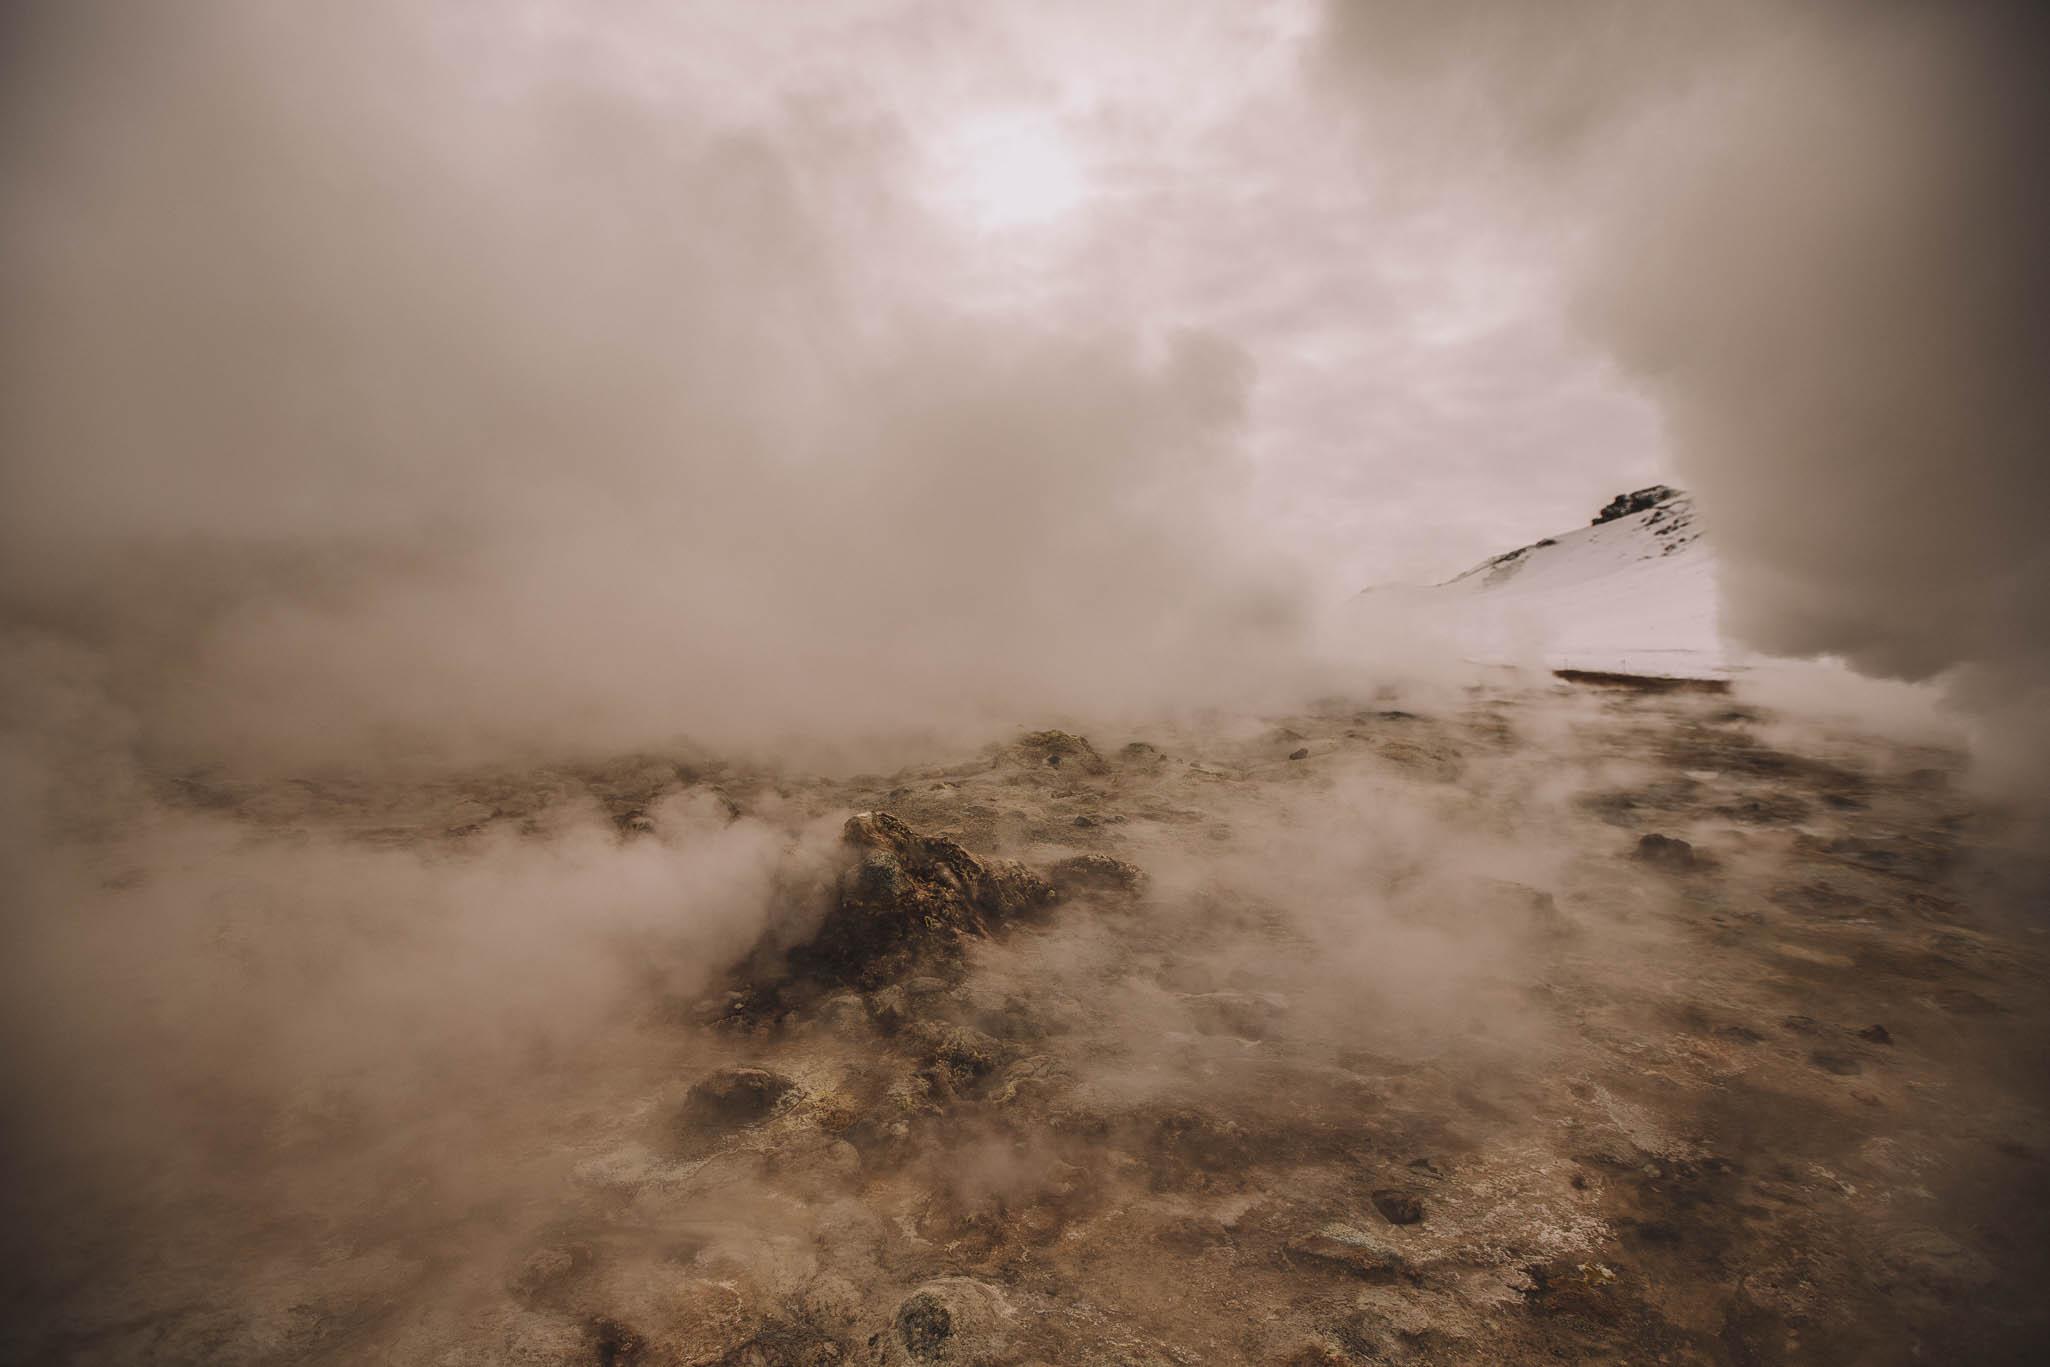 Road-trip-Islande-Iceland-Voyage-Travel-Portrait-Jérémy-Boyer-Hverir-Steam-mountains-montagnes-vapeur-16.jpg